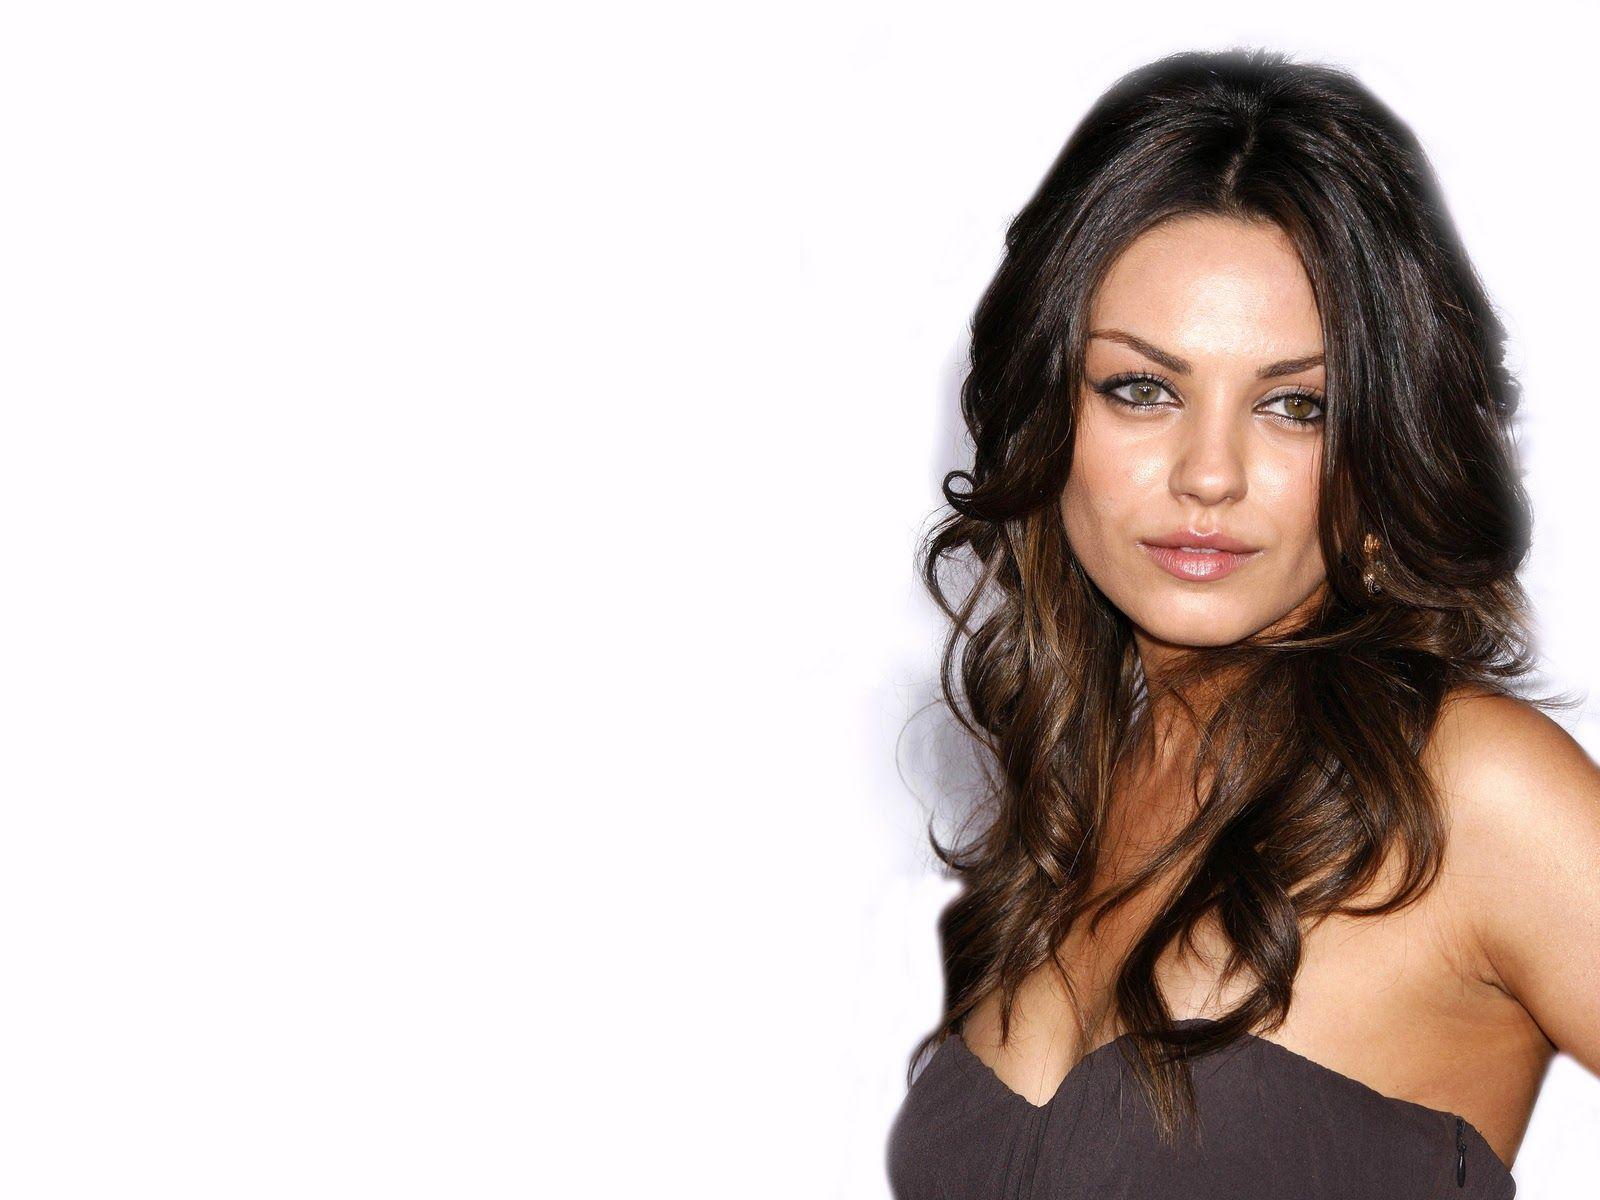 Mila Kunis Wallpapers - Best HD Desktop Wallpaper